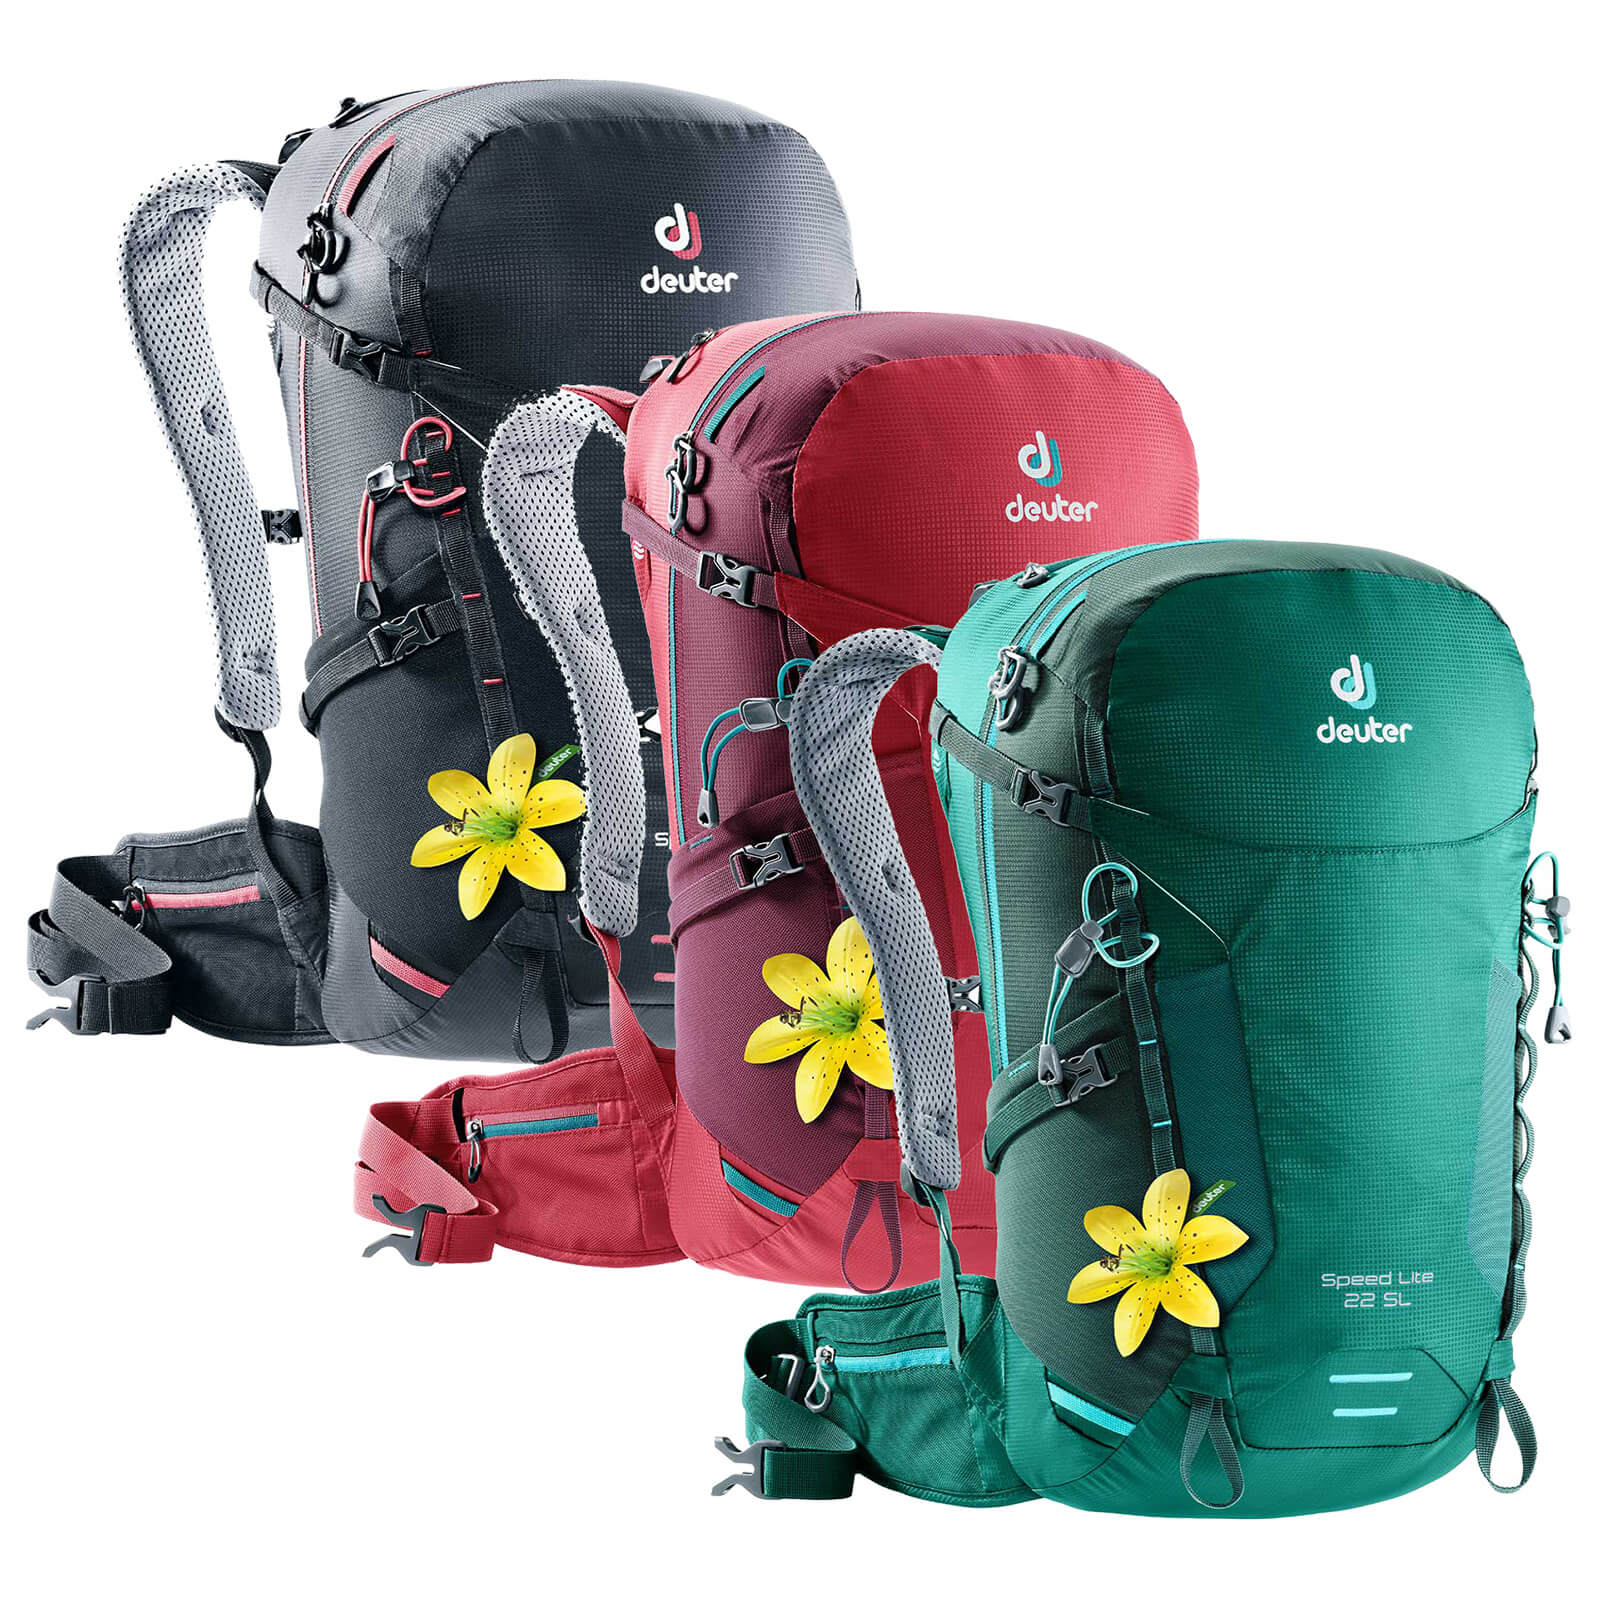 footwear hot products online retailer Deuter Speed Lite SL 22L Backpack